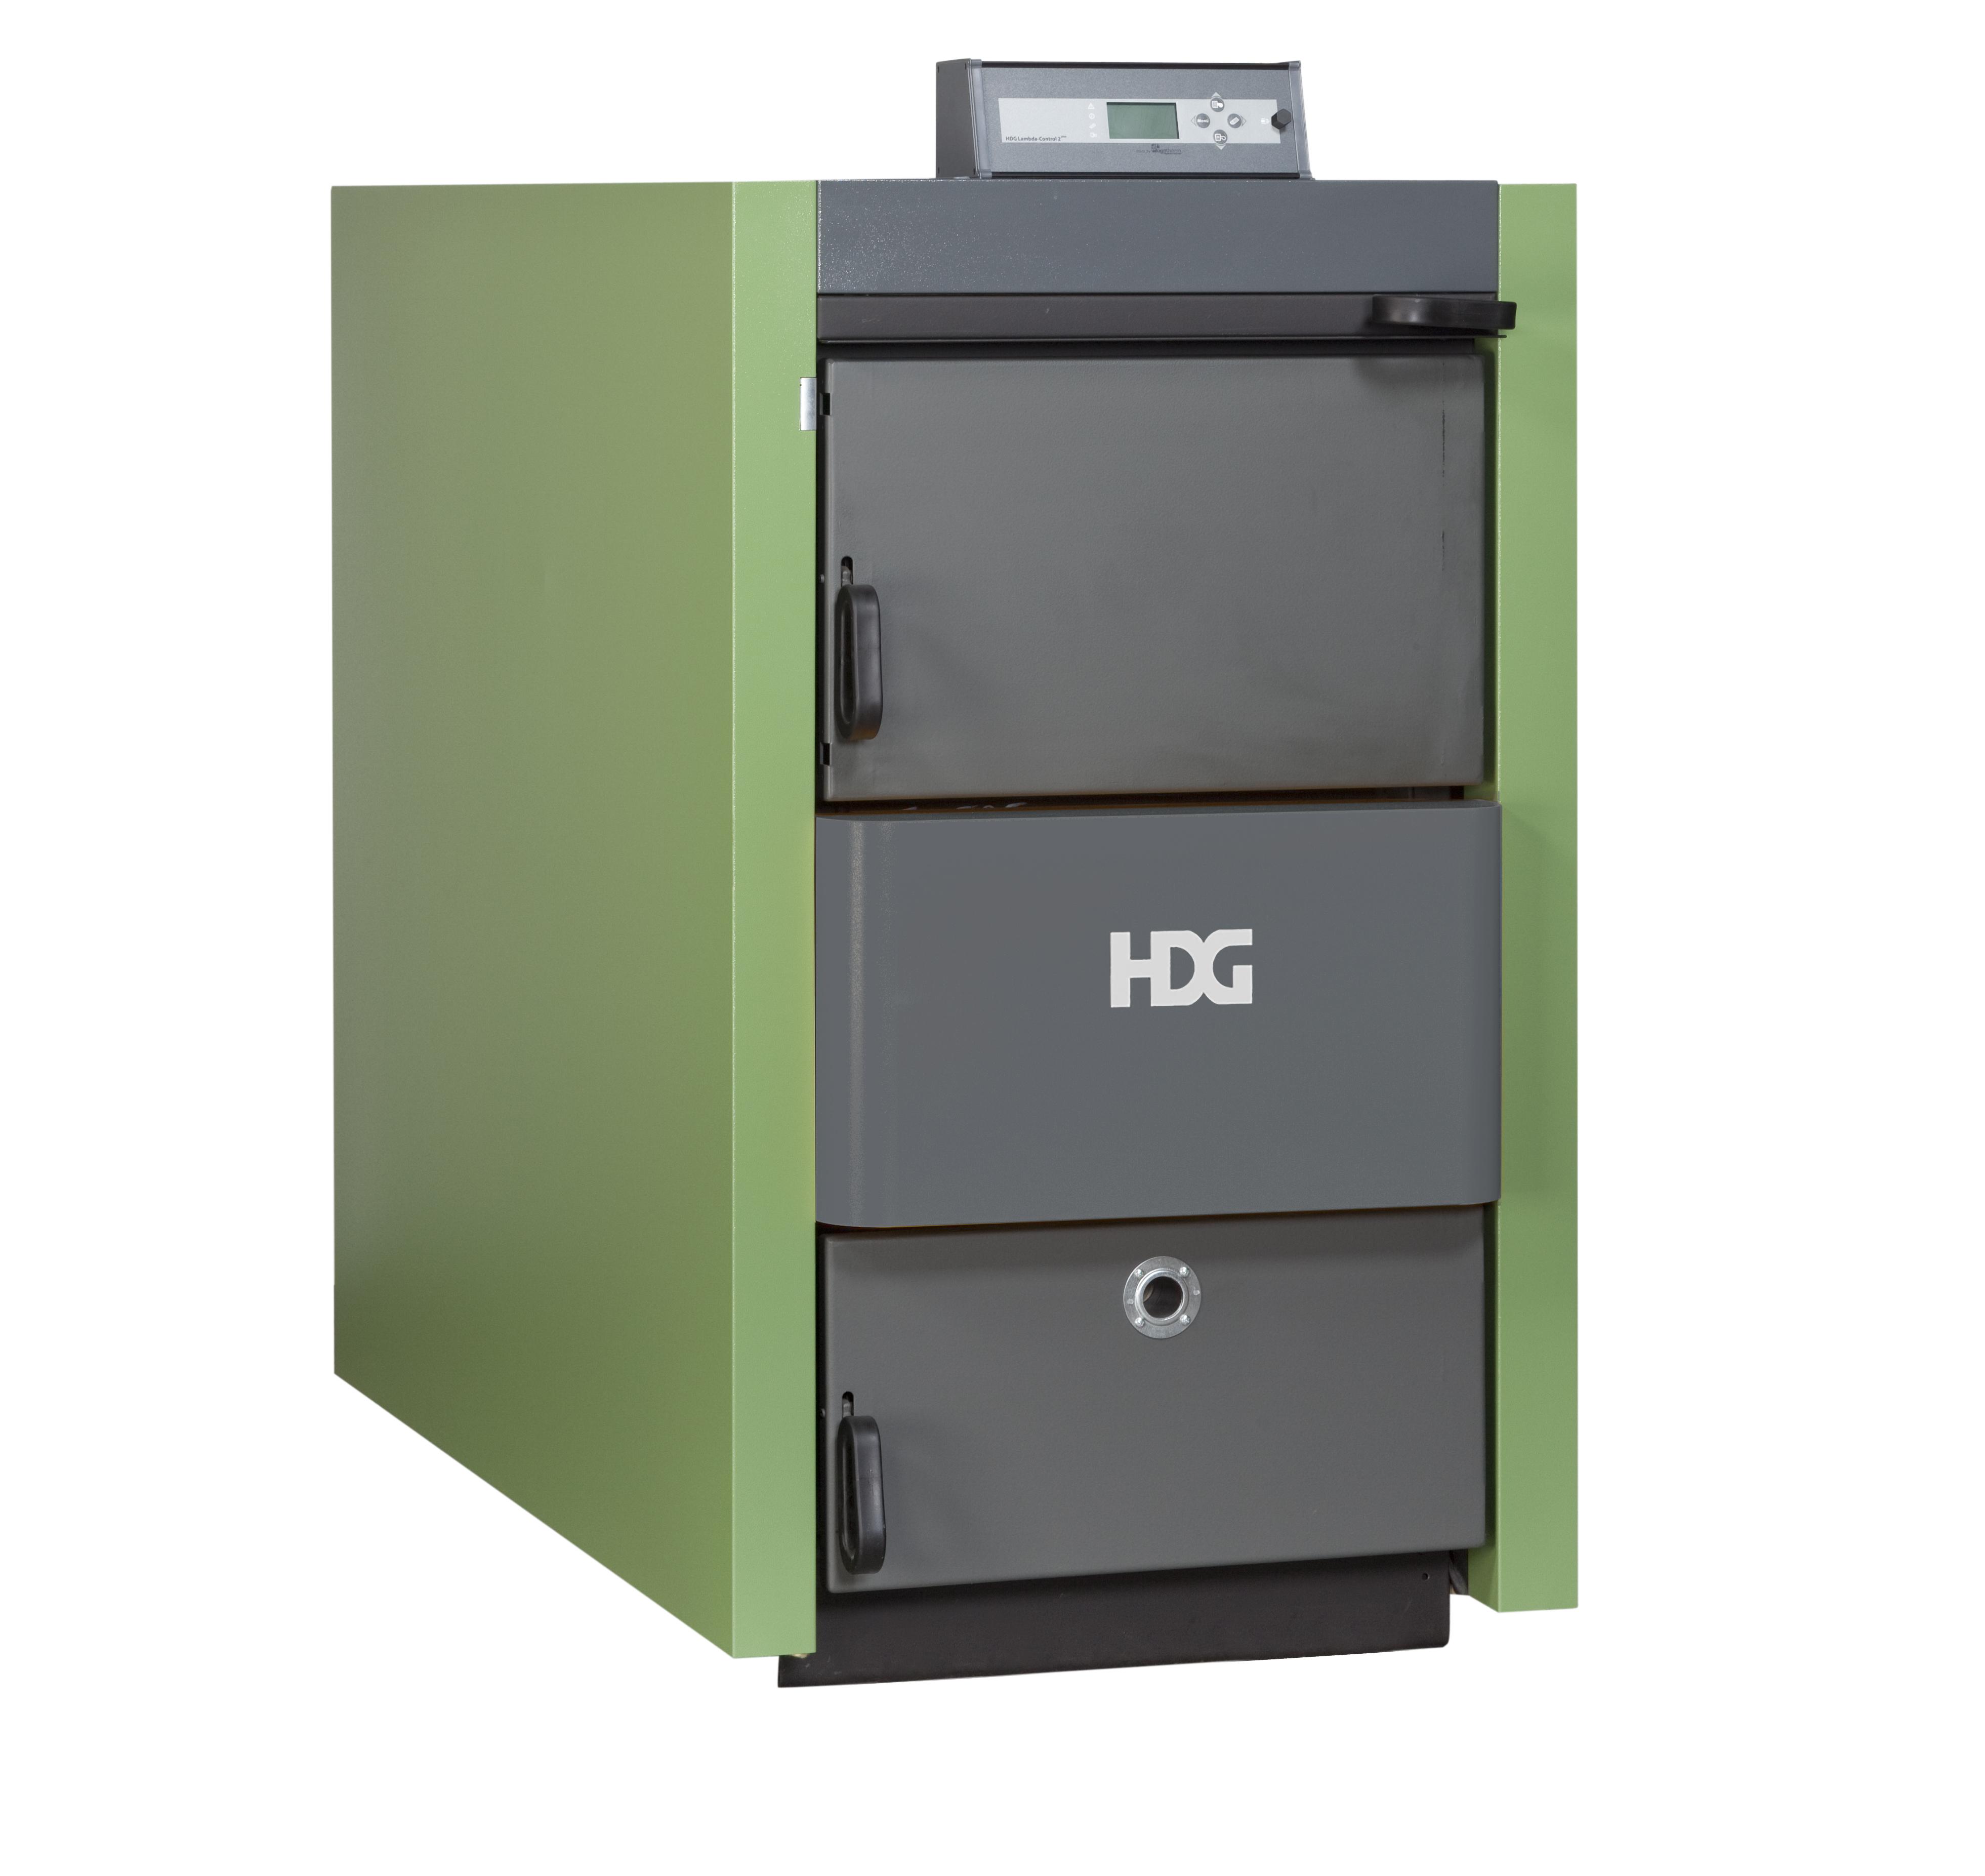 HDG TURBOTEC 50 - 60